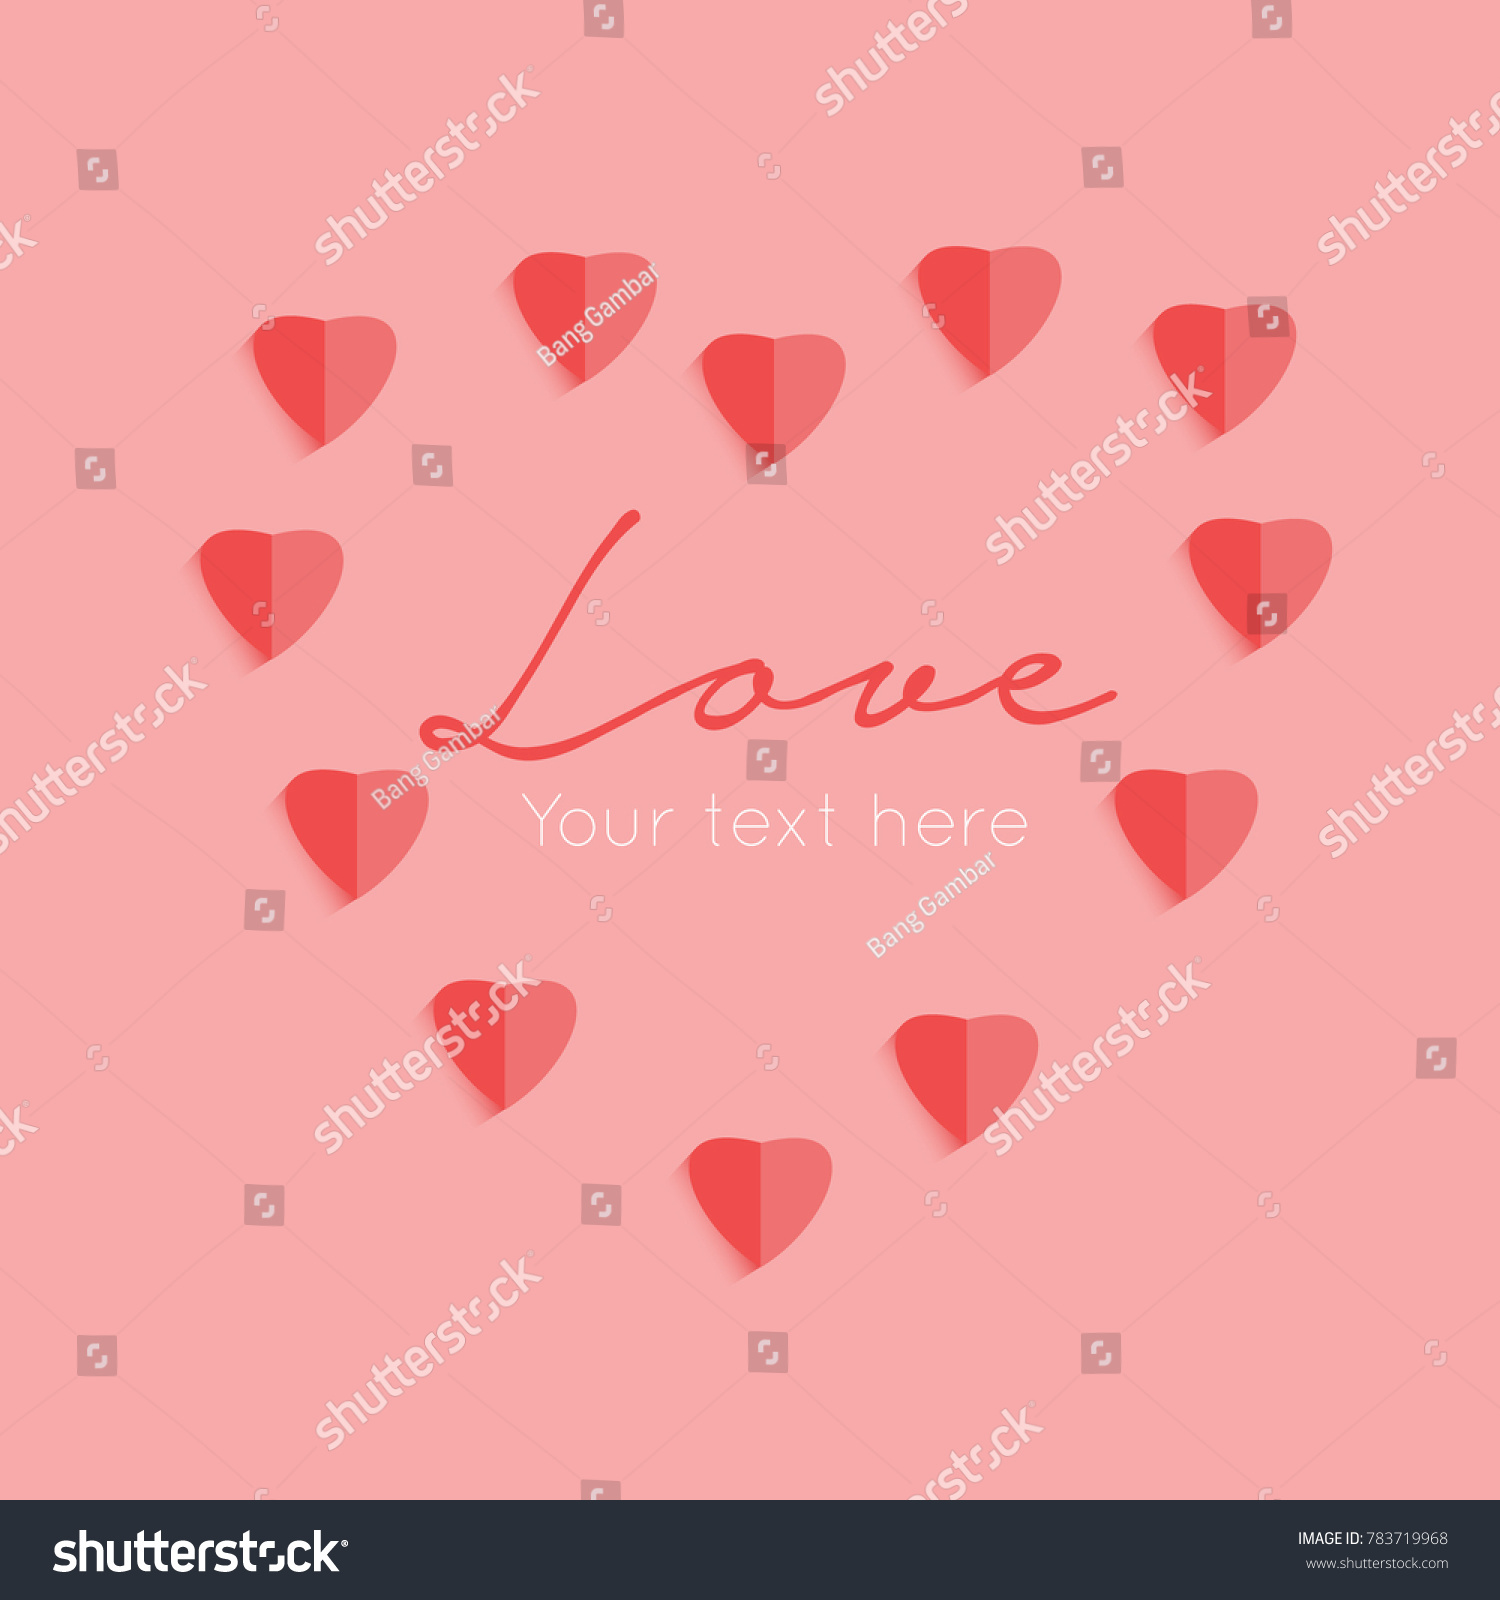 Love Greetings Vector Stock Vector Royalty Free 783719968